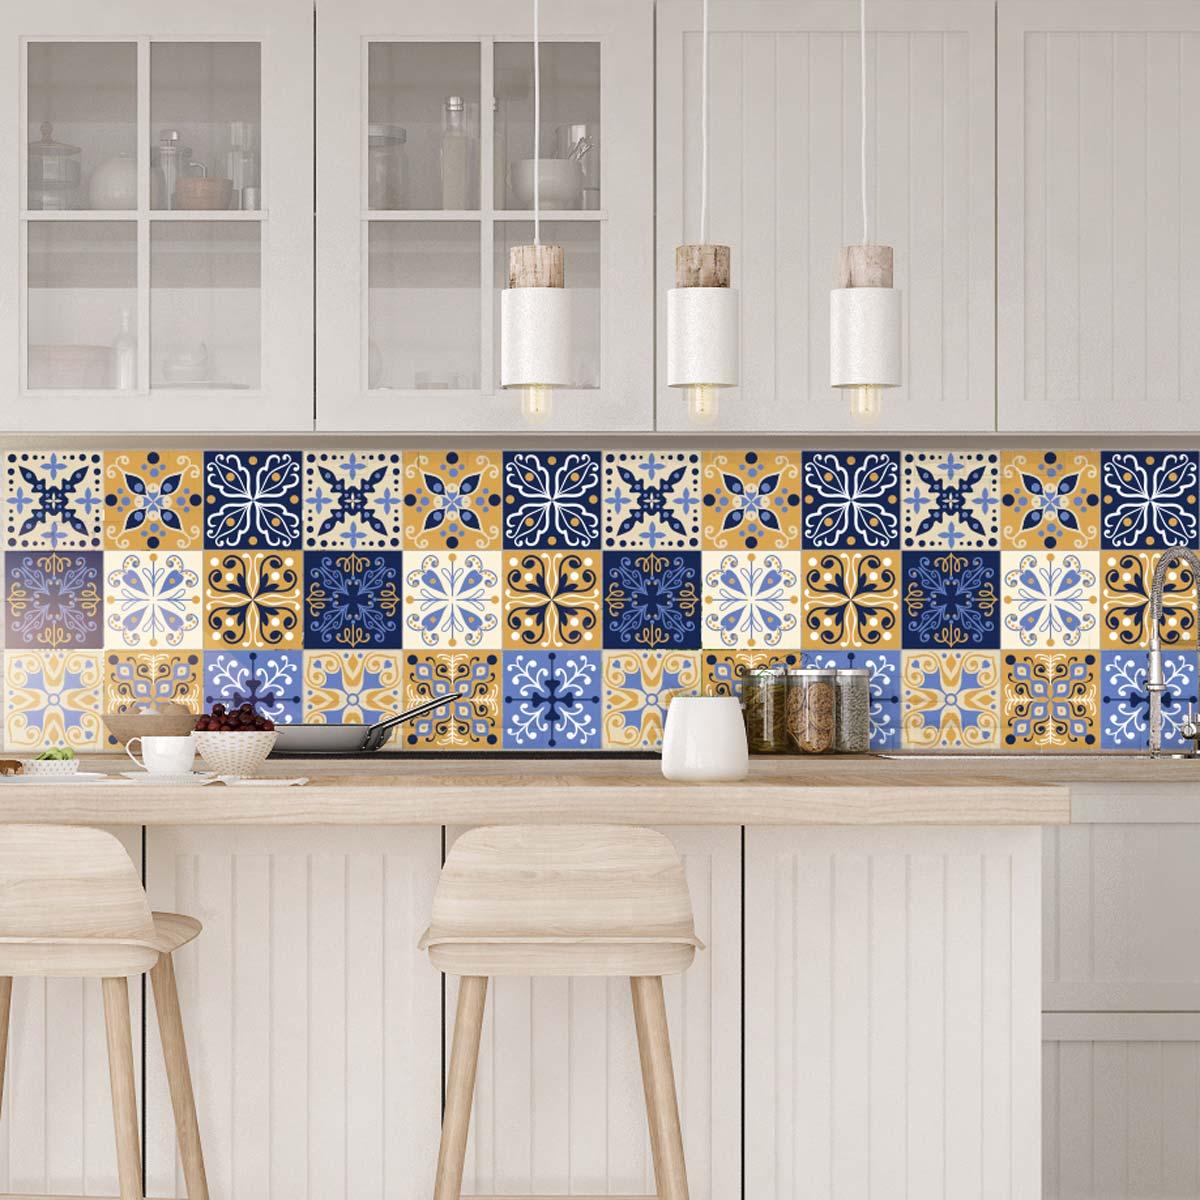 9 stickers carrelages azulejos born o art et design artistiques ambiance sticker. Black Bedroom Furniture Sets. Home Design Ideas